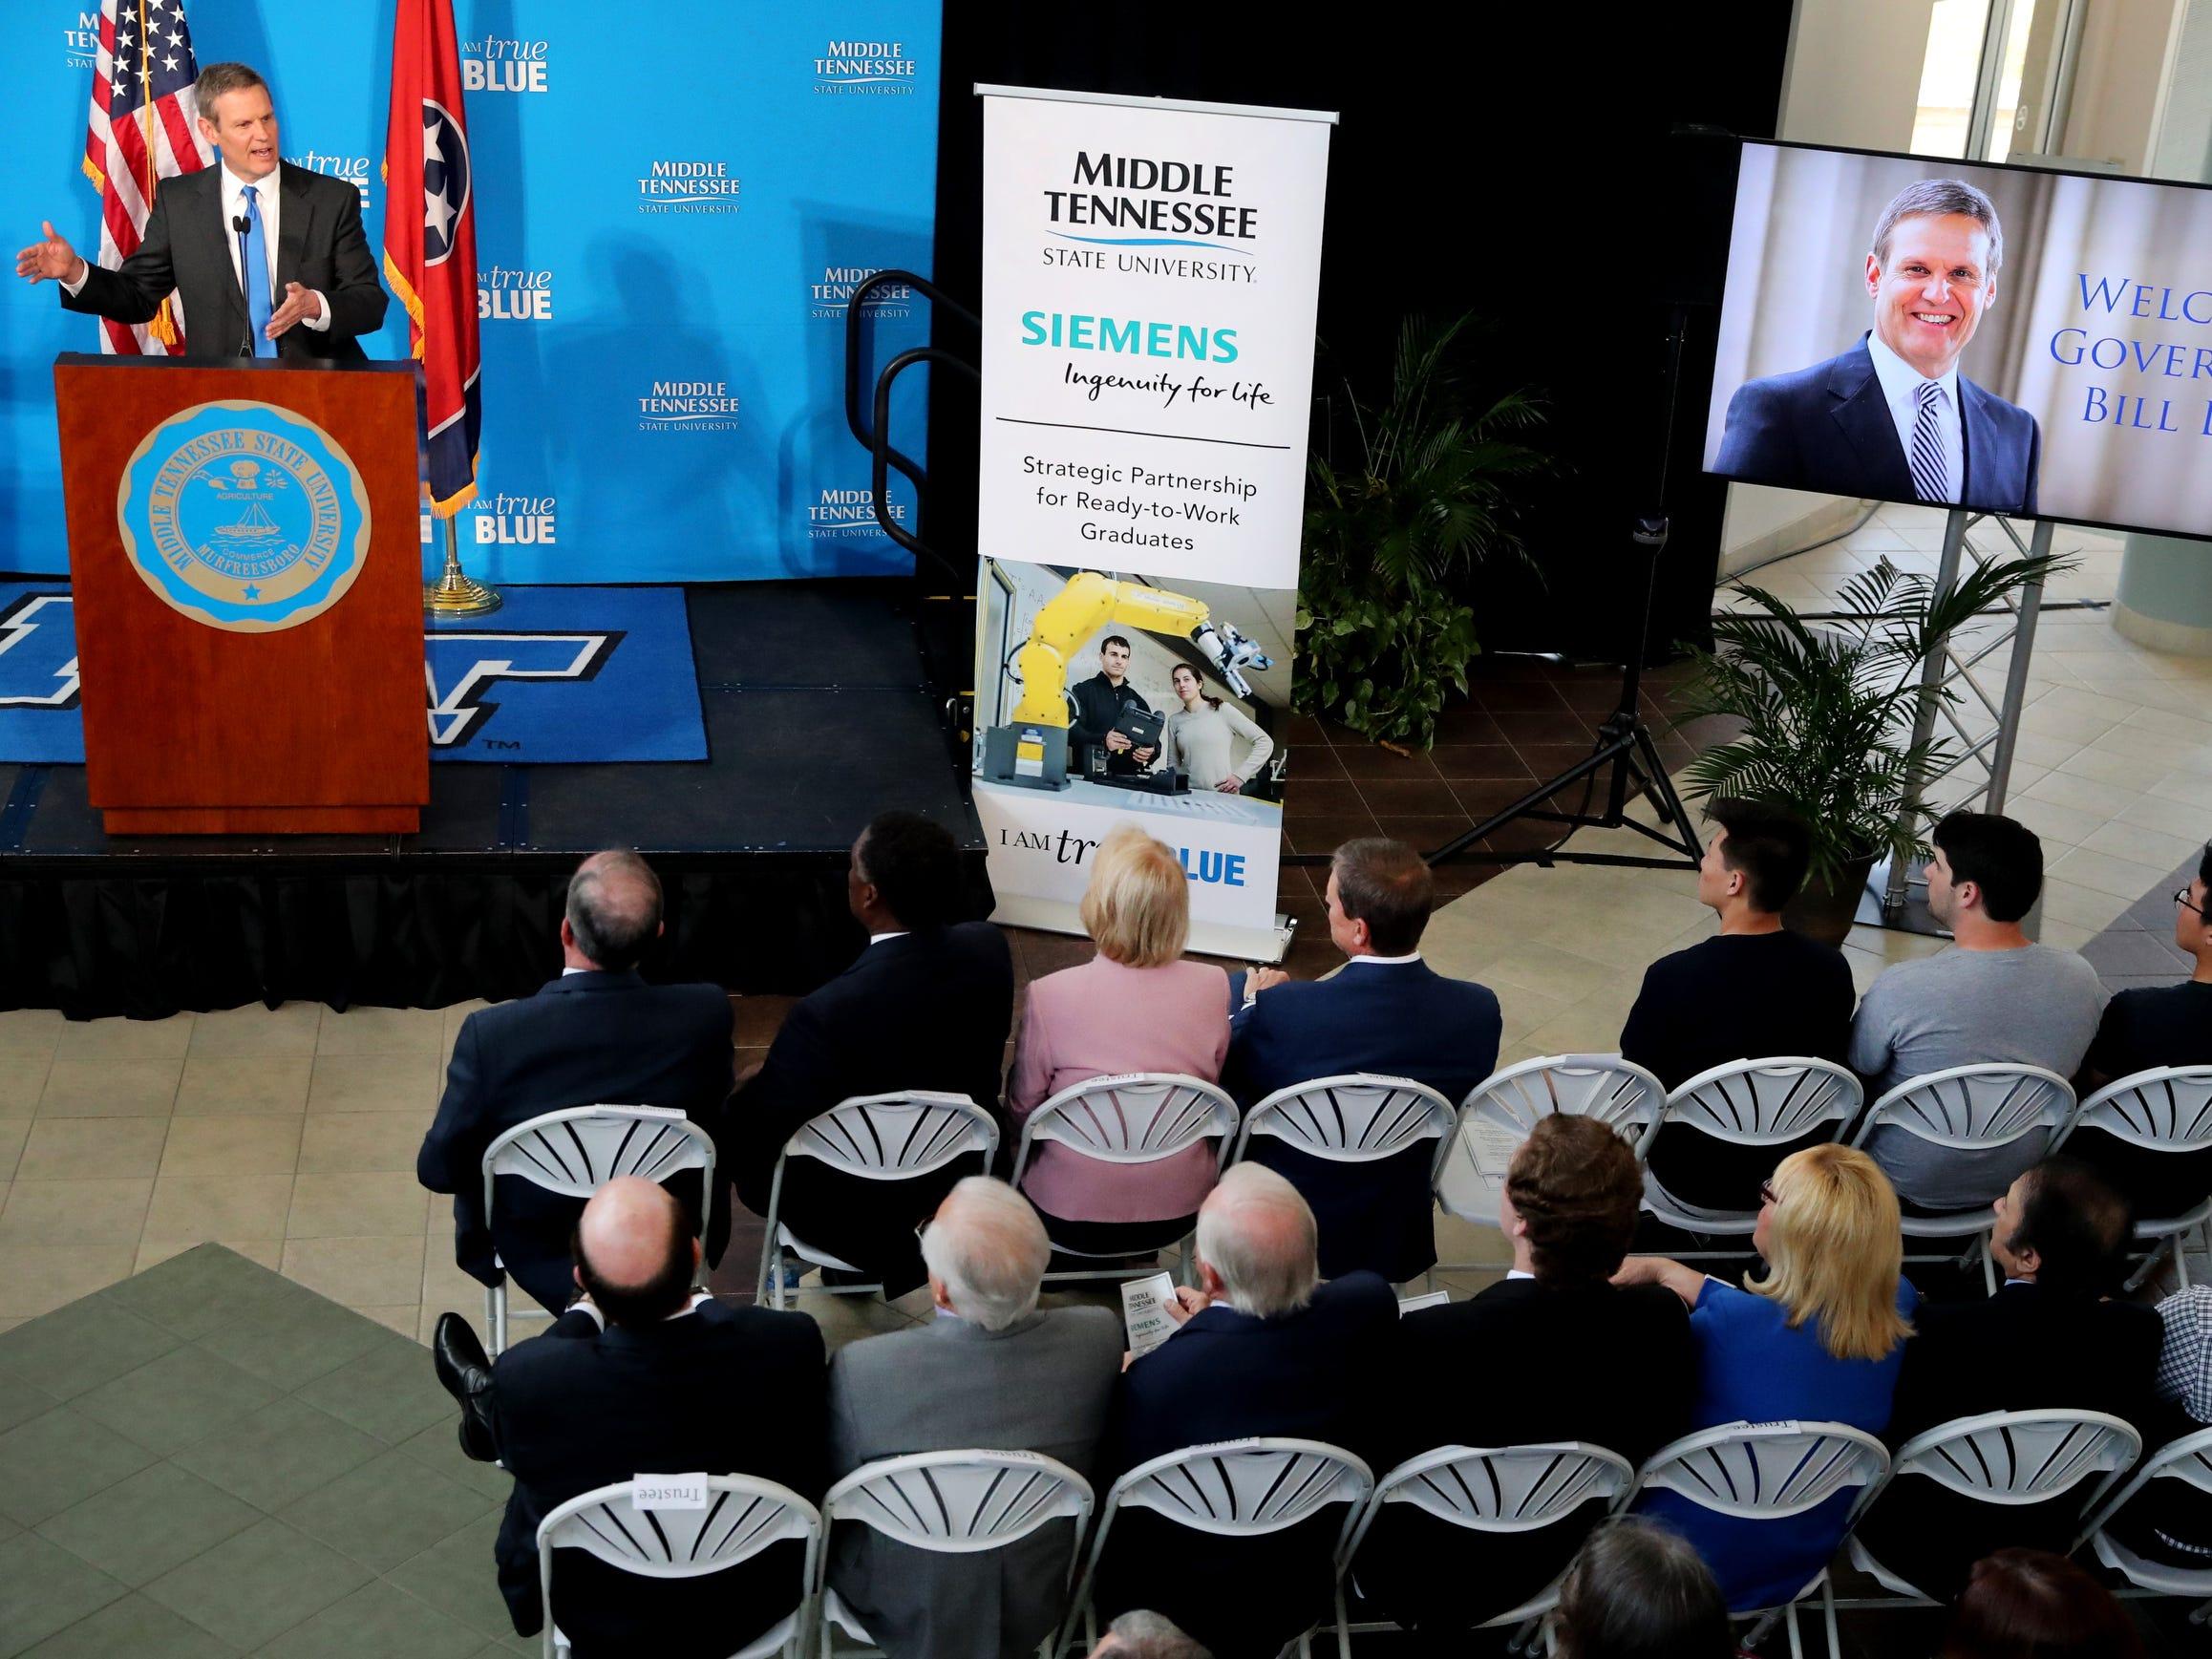 Tennessee Governor Bill Lee spokesman at MTSU's program recognizing the Siemens' grant to MTSU's Mechatronics Engineering program, on Wednesday April 3, 2019.